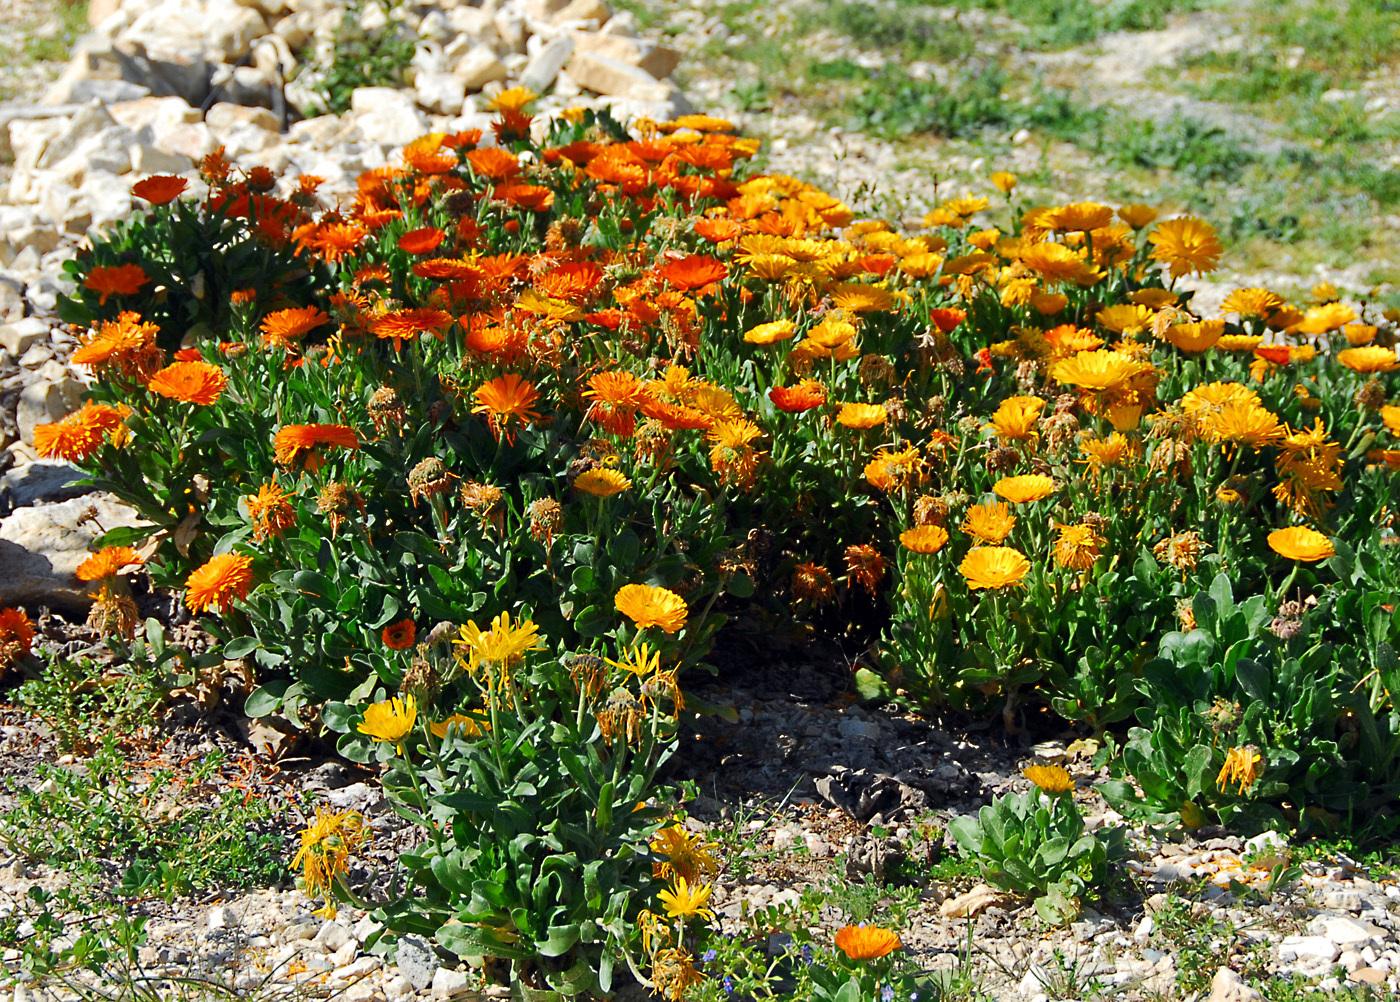 https://pictures.bgbm.org/digilib/Scaler?fn=Cyprus/Calendula_officinalis_B1.jpg&mo=file